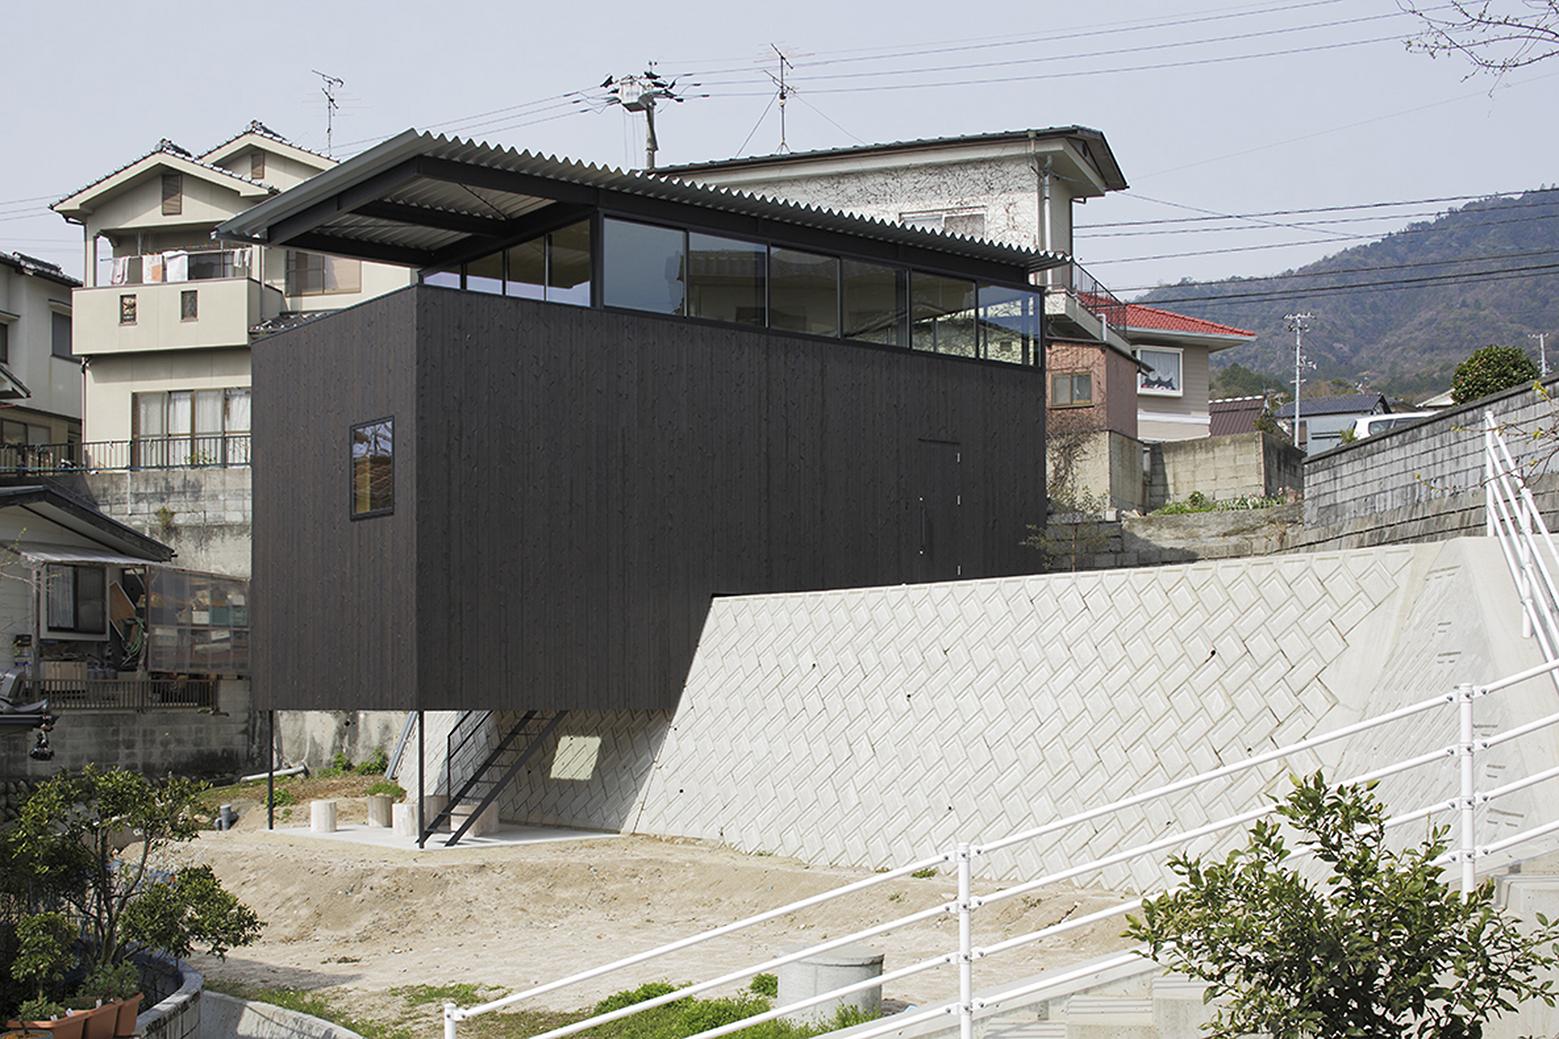 540ea15ac07a802ff5000173_house-in-miyake-hidetaka-nakahara-architects-yoshio-ohno-architects_oono_miyake_140407_011